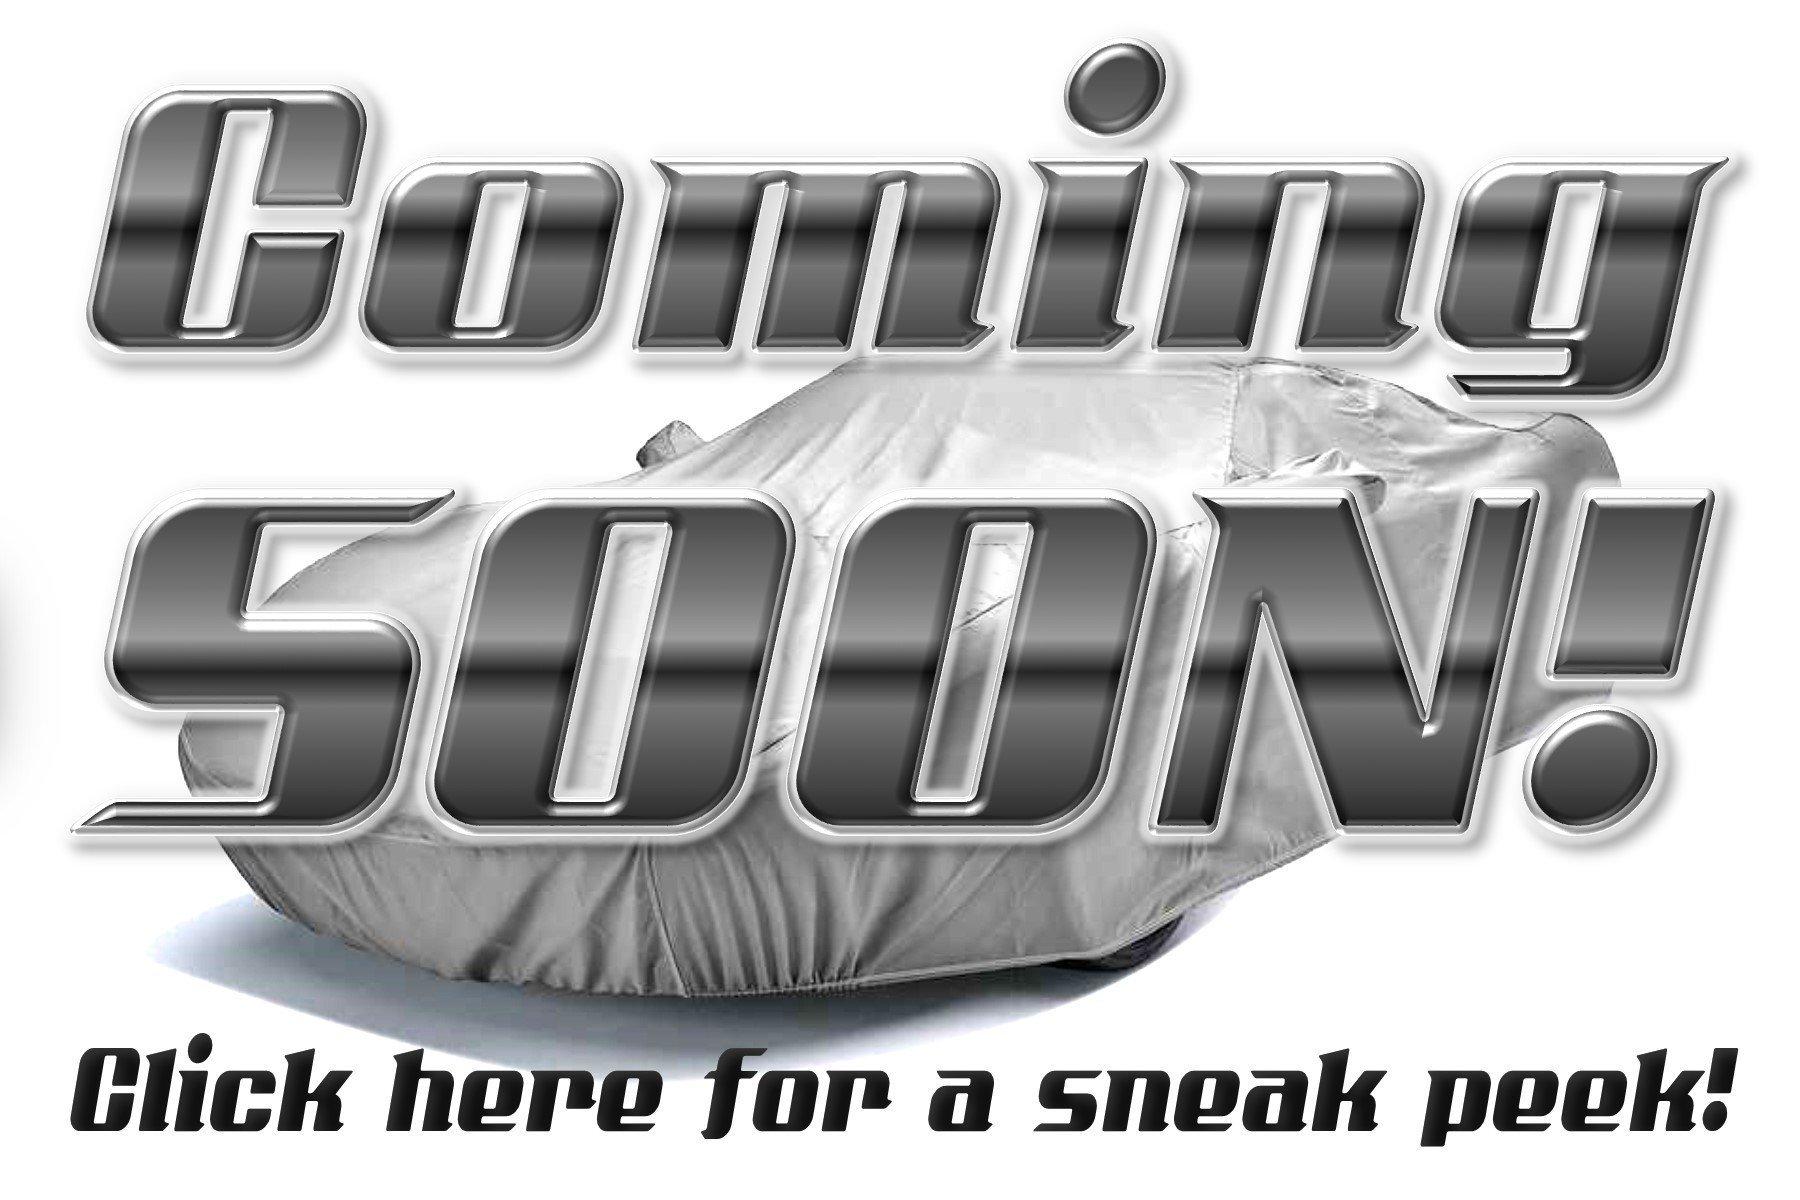 39168577ca9b61 hd 1968 chevrolet corvette